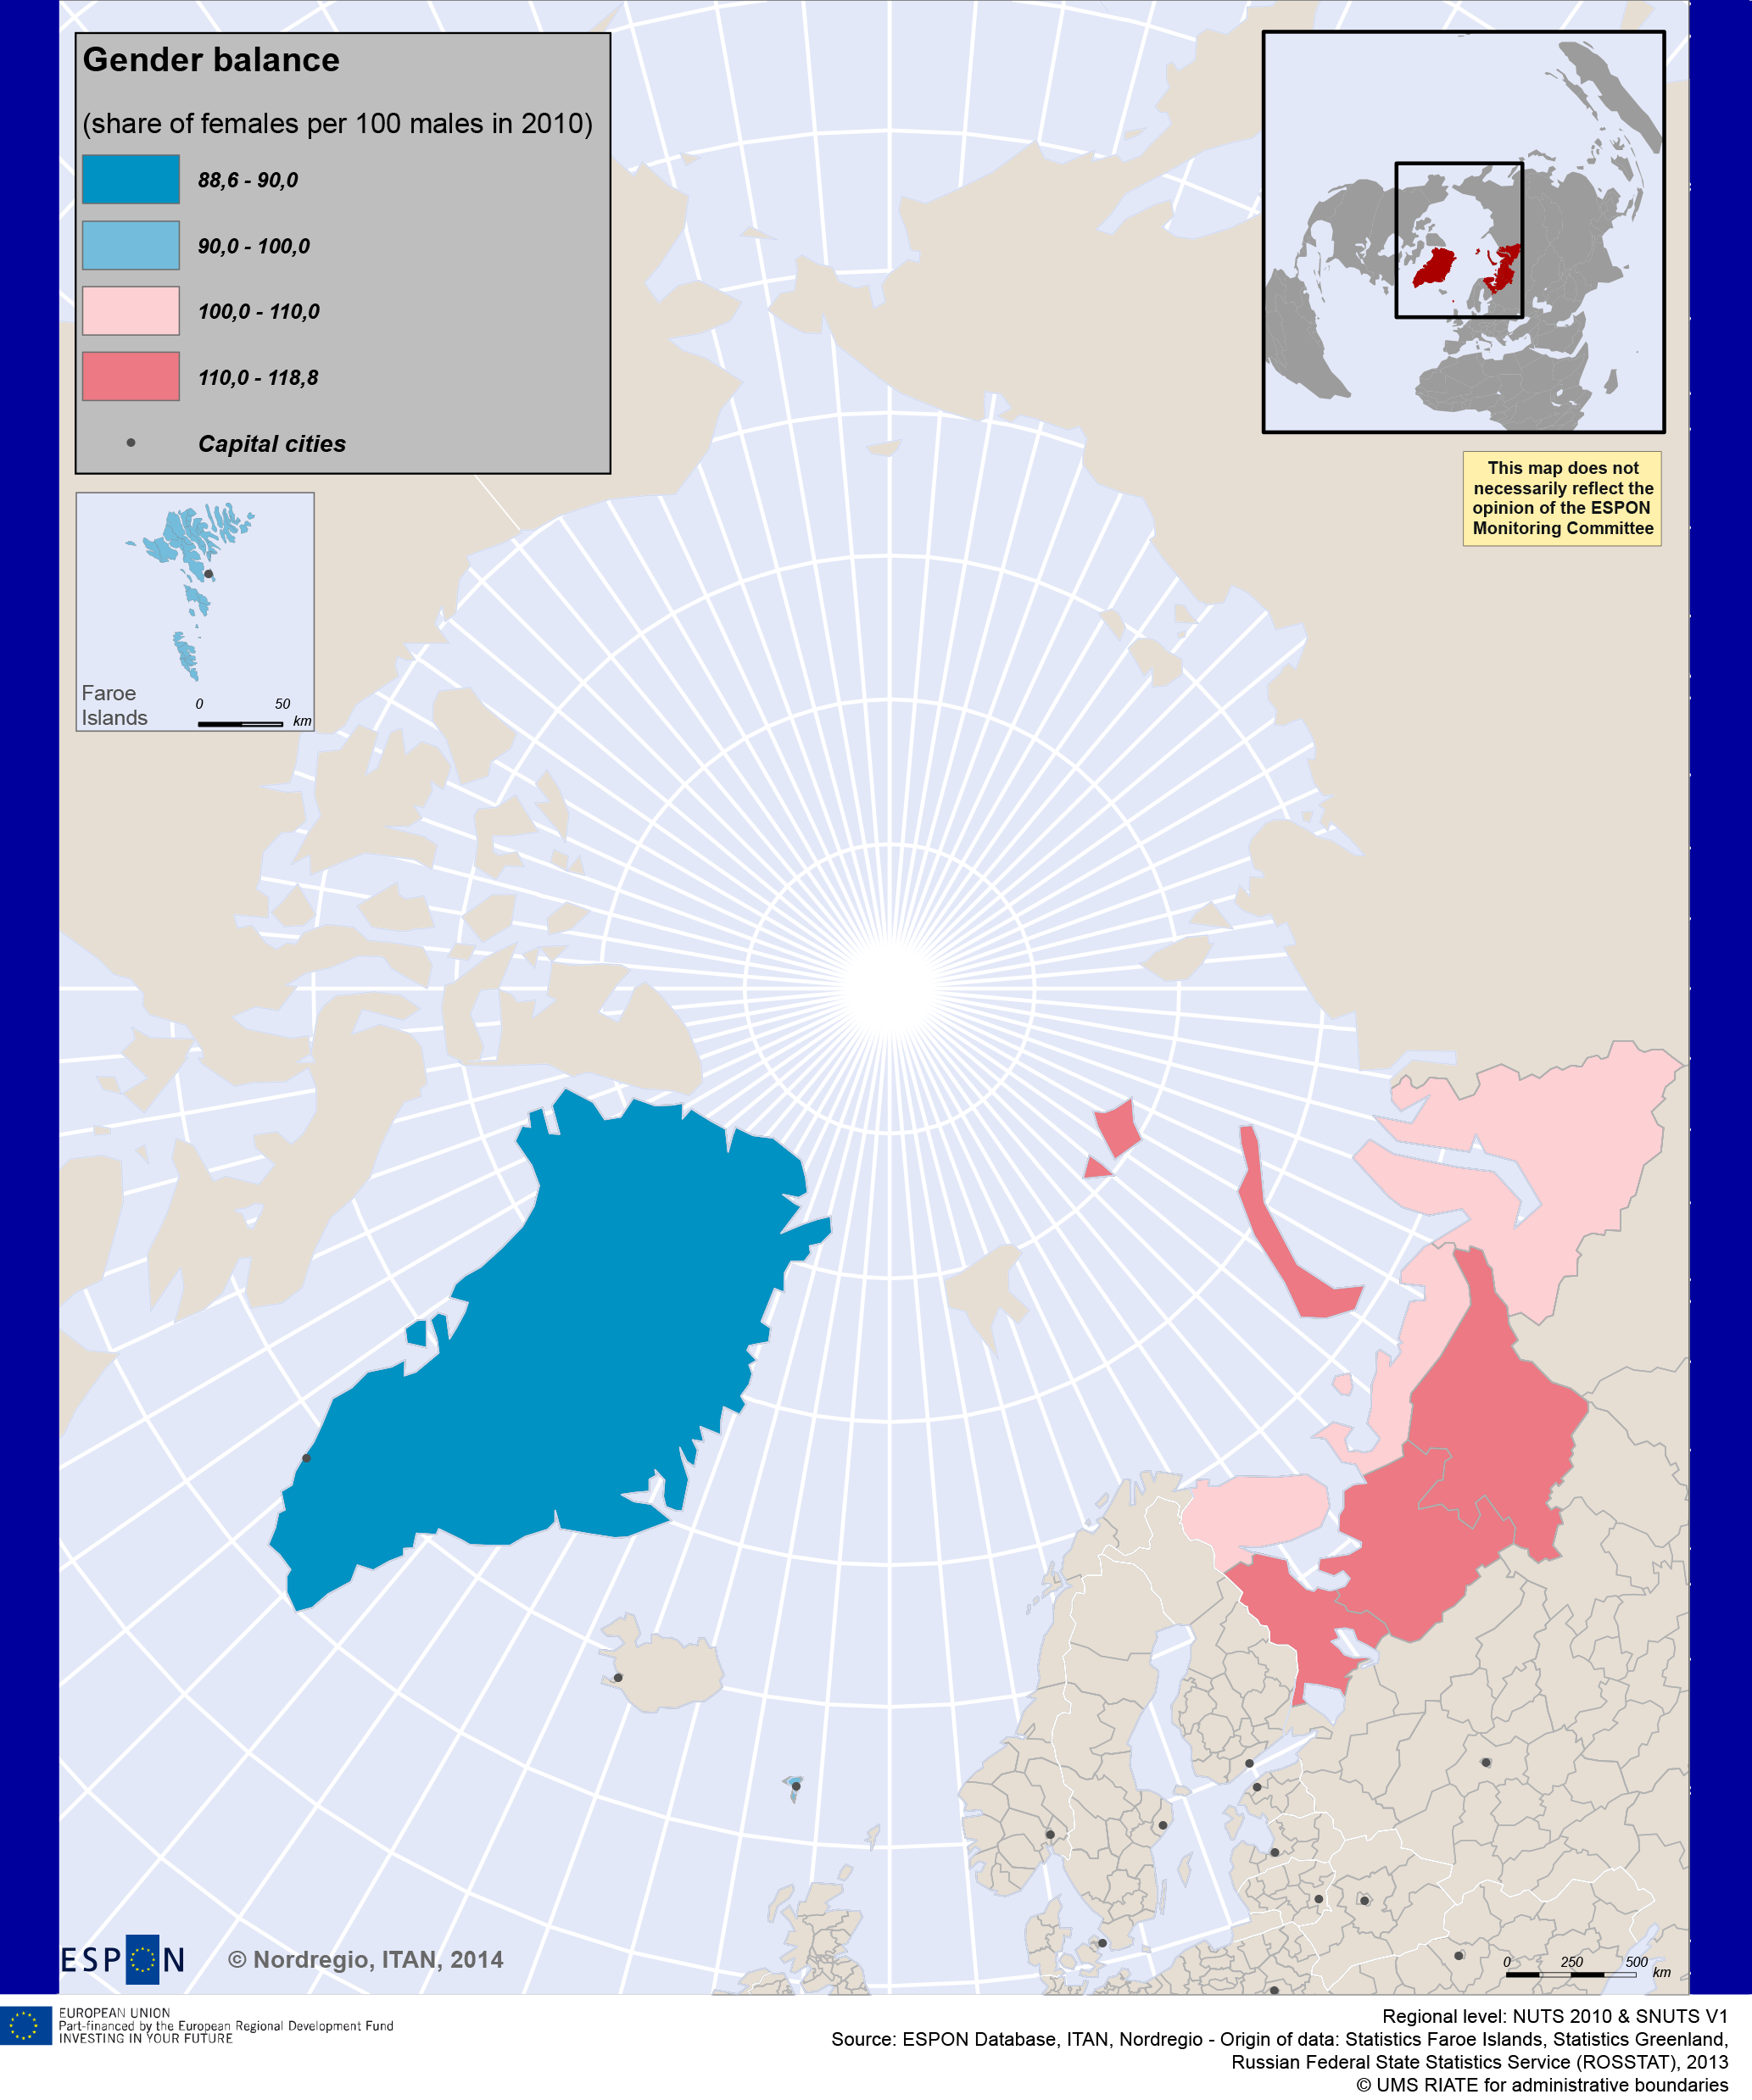 Map 3. The Gender Balance